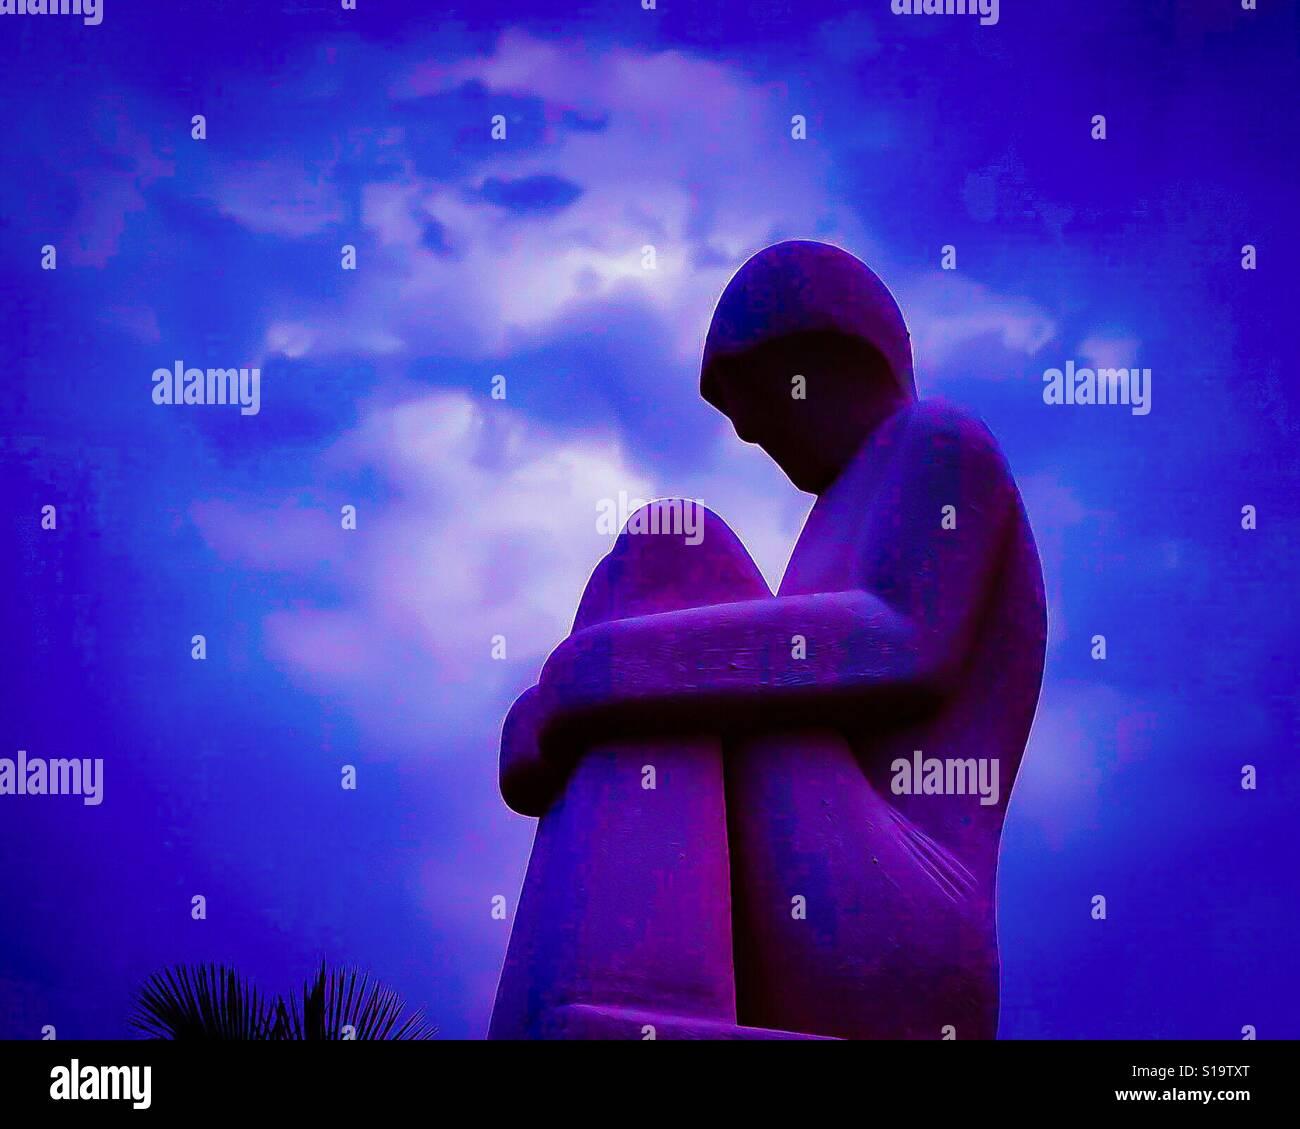 Statuary at night - Stock Image